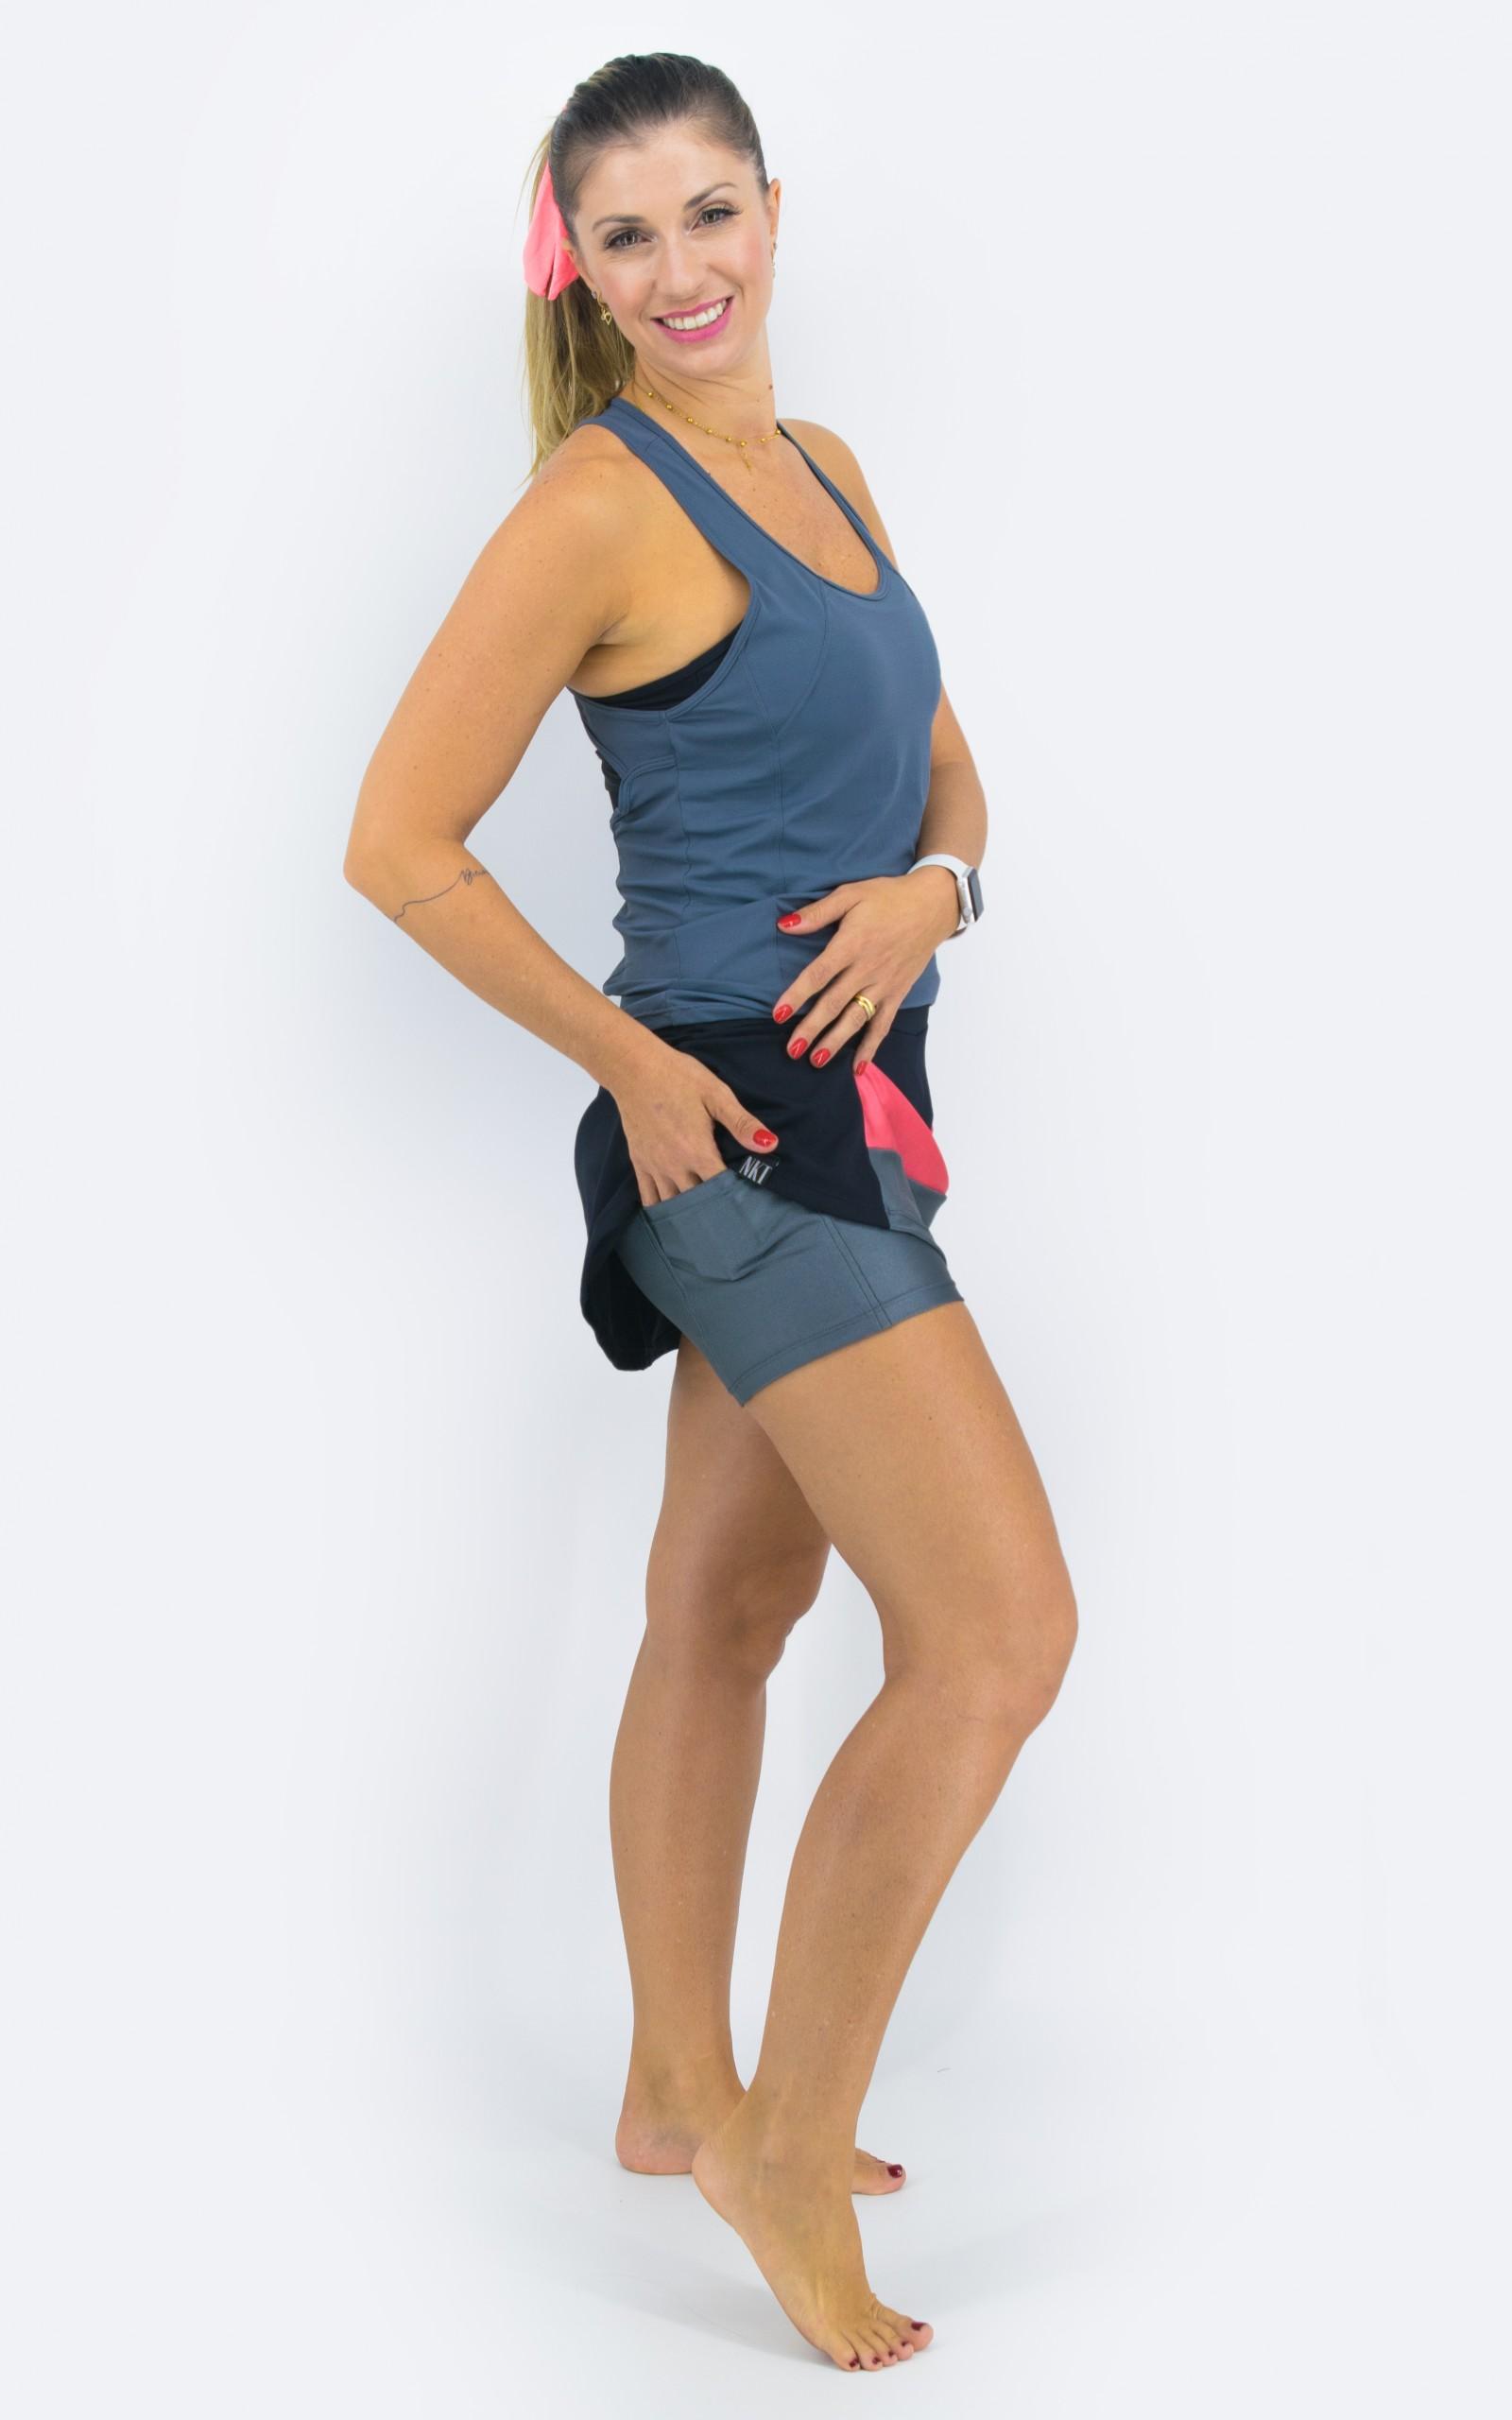 Saia Shorts Spring Chumbo, Coleção YOURSELF - NKT Fitwear Moda Fitness